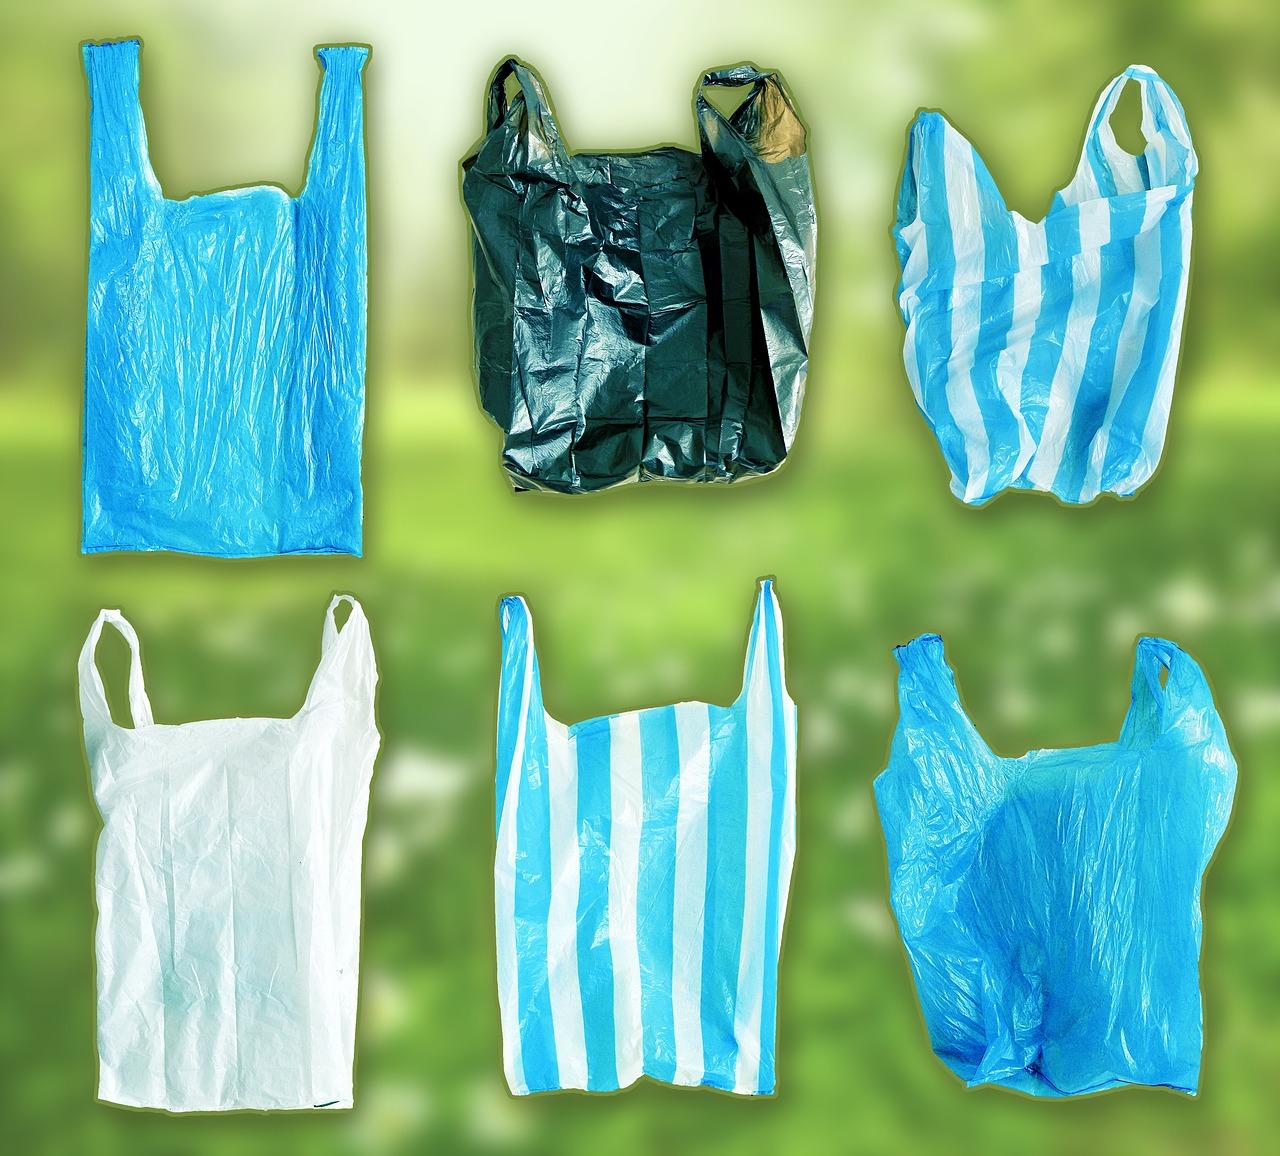 Plastic Bag - Free photo on Pixabay